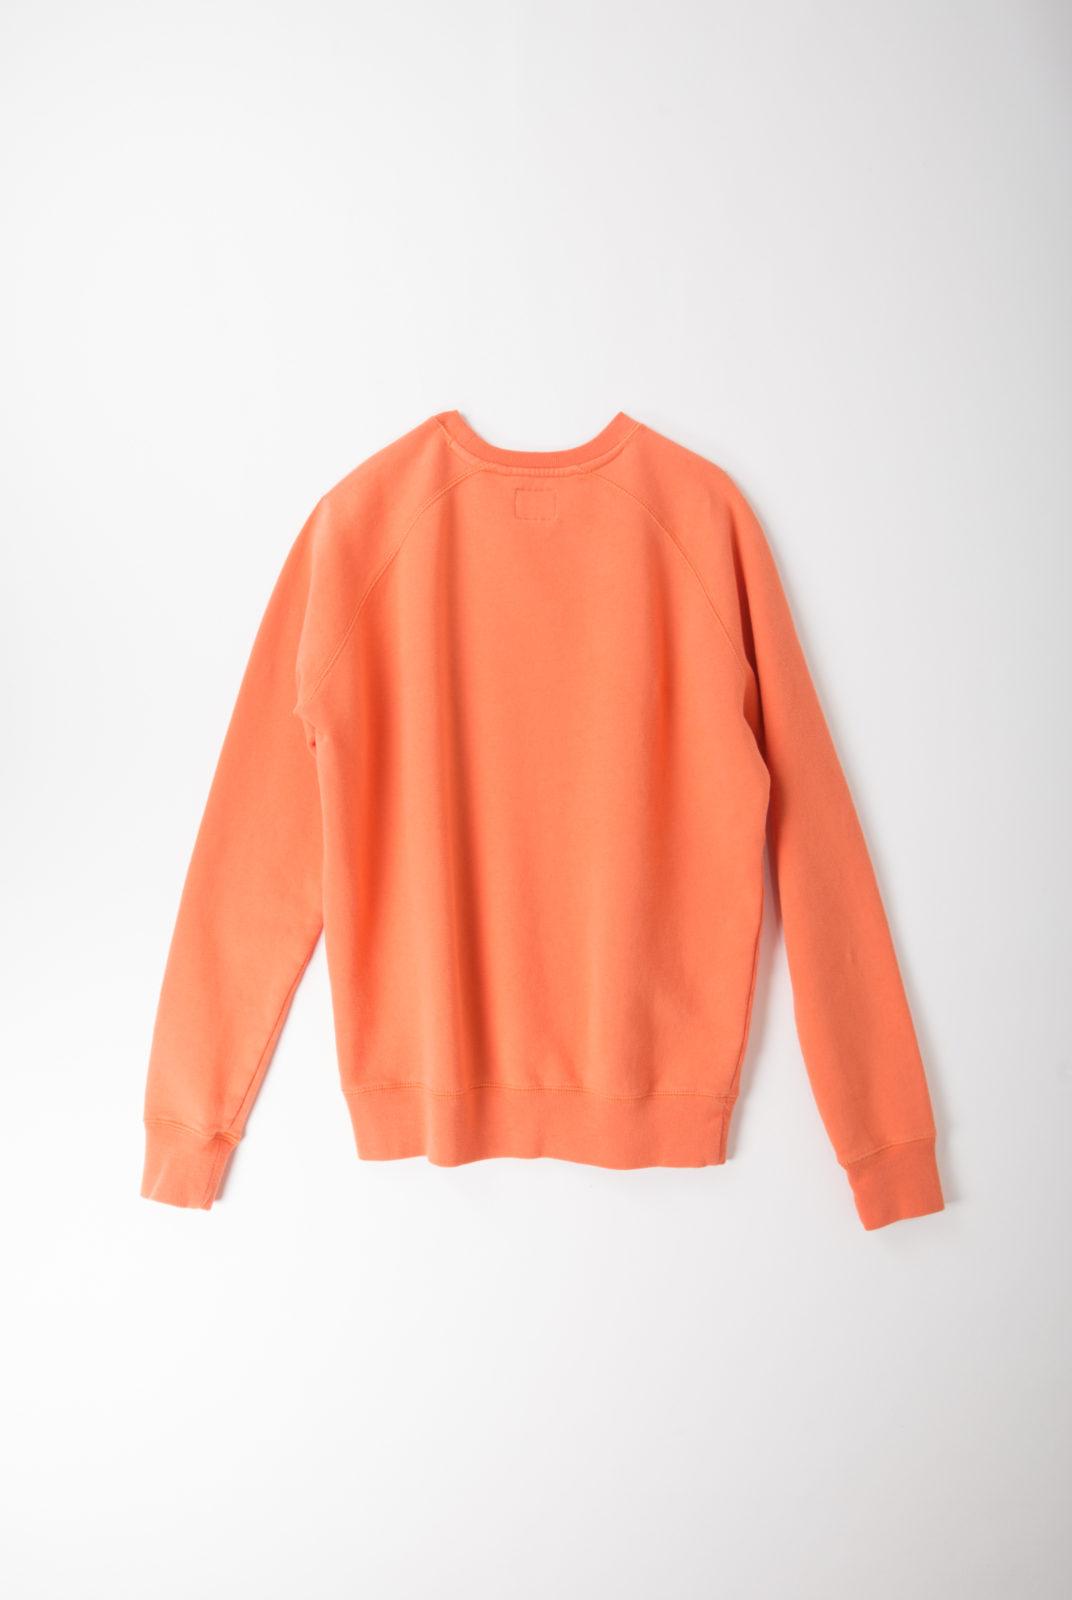 sweat, orange, coton, encolure ronde, manches longues, holiday